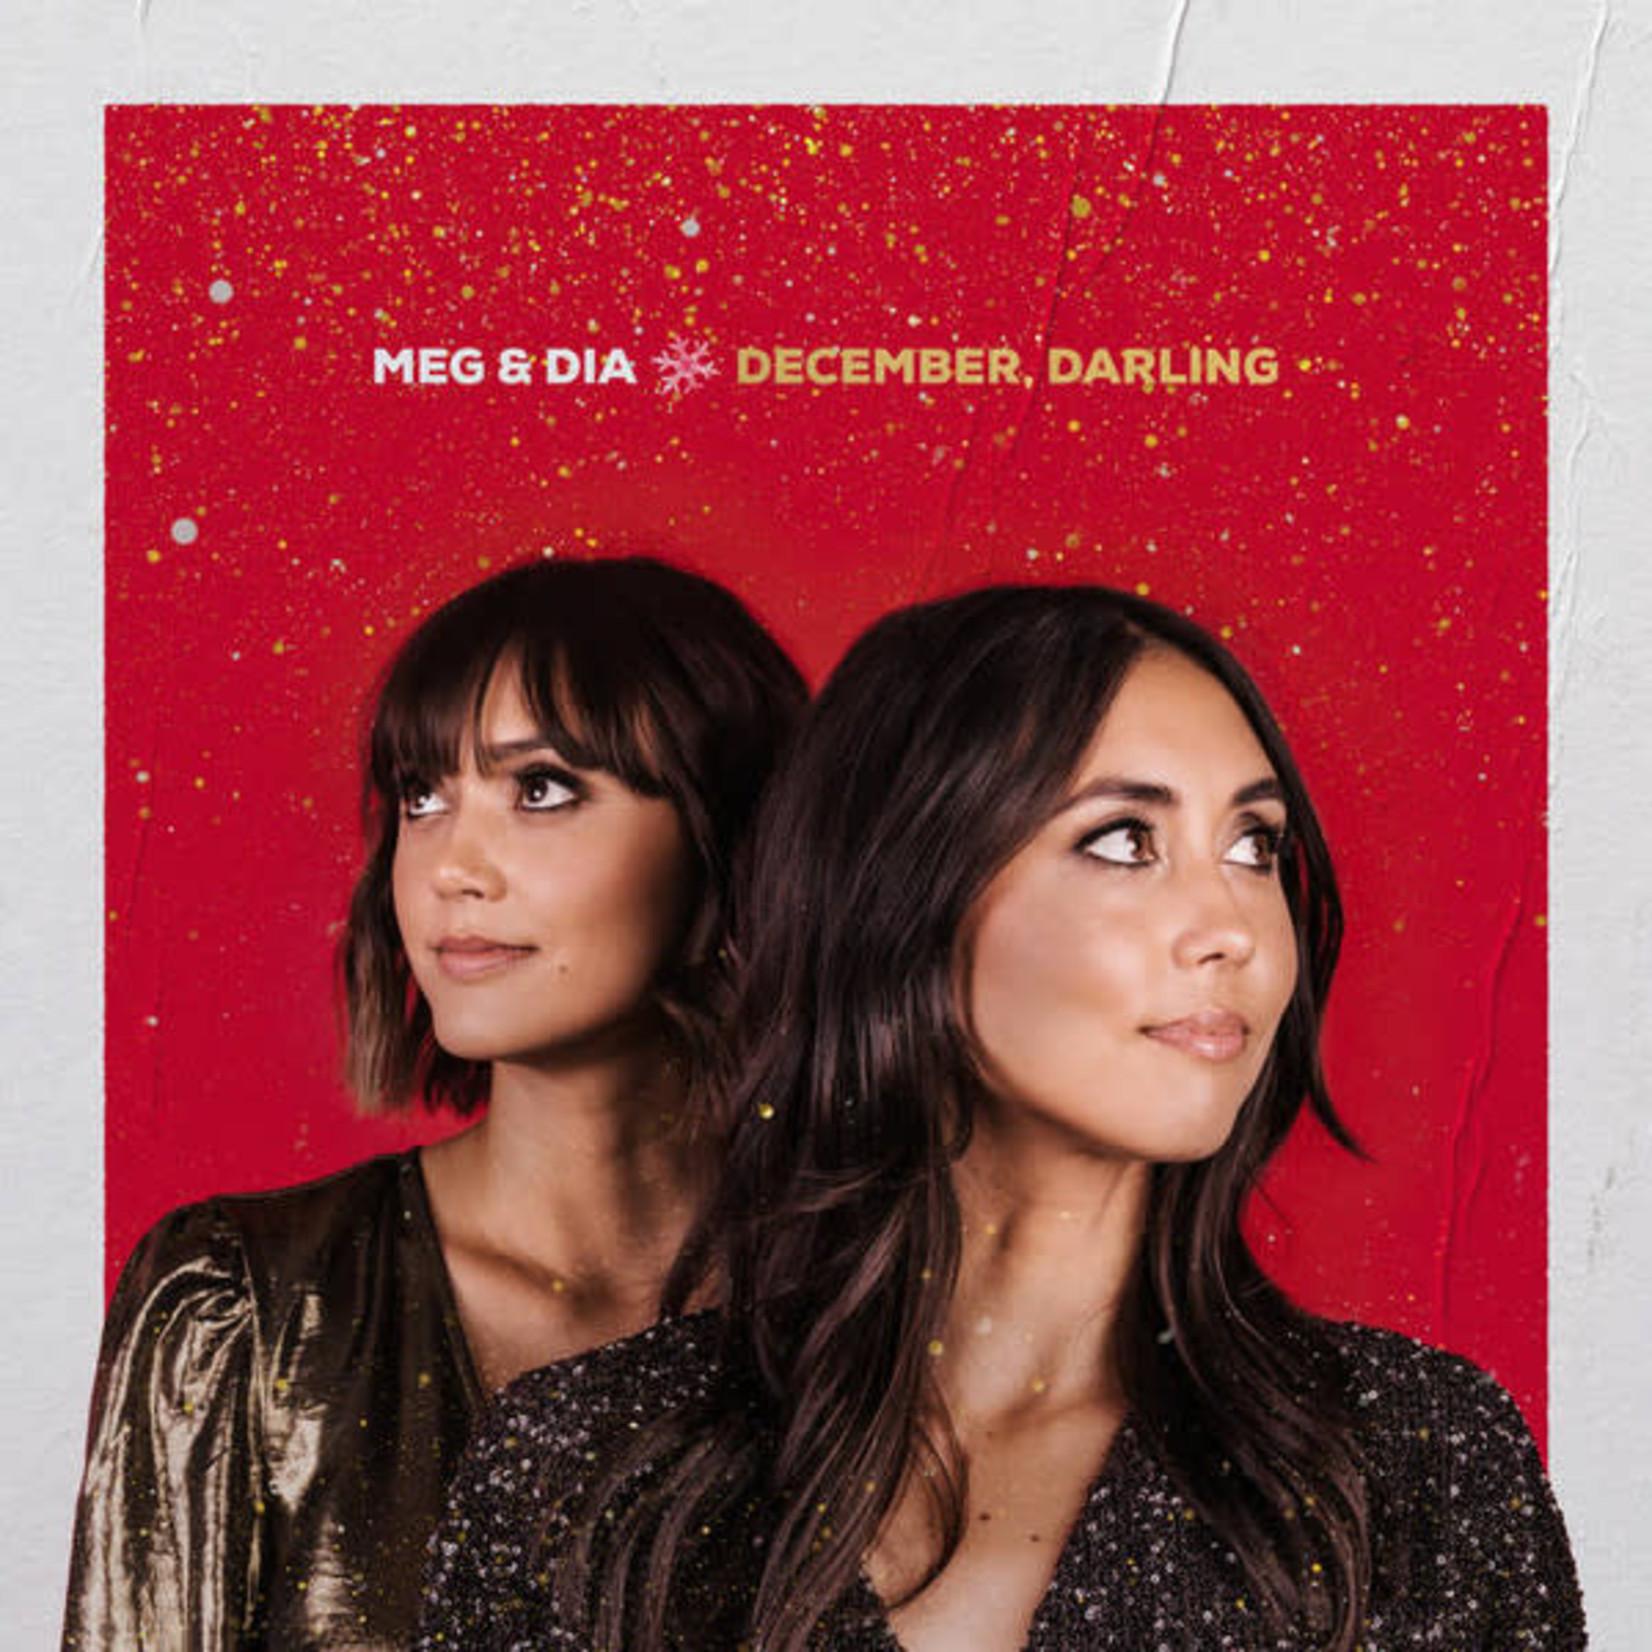 MEG & DIA DECEMBER, DARLING (LP)